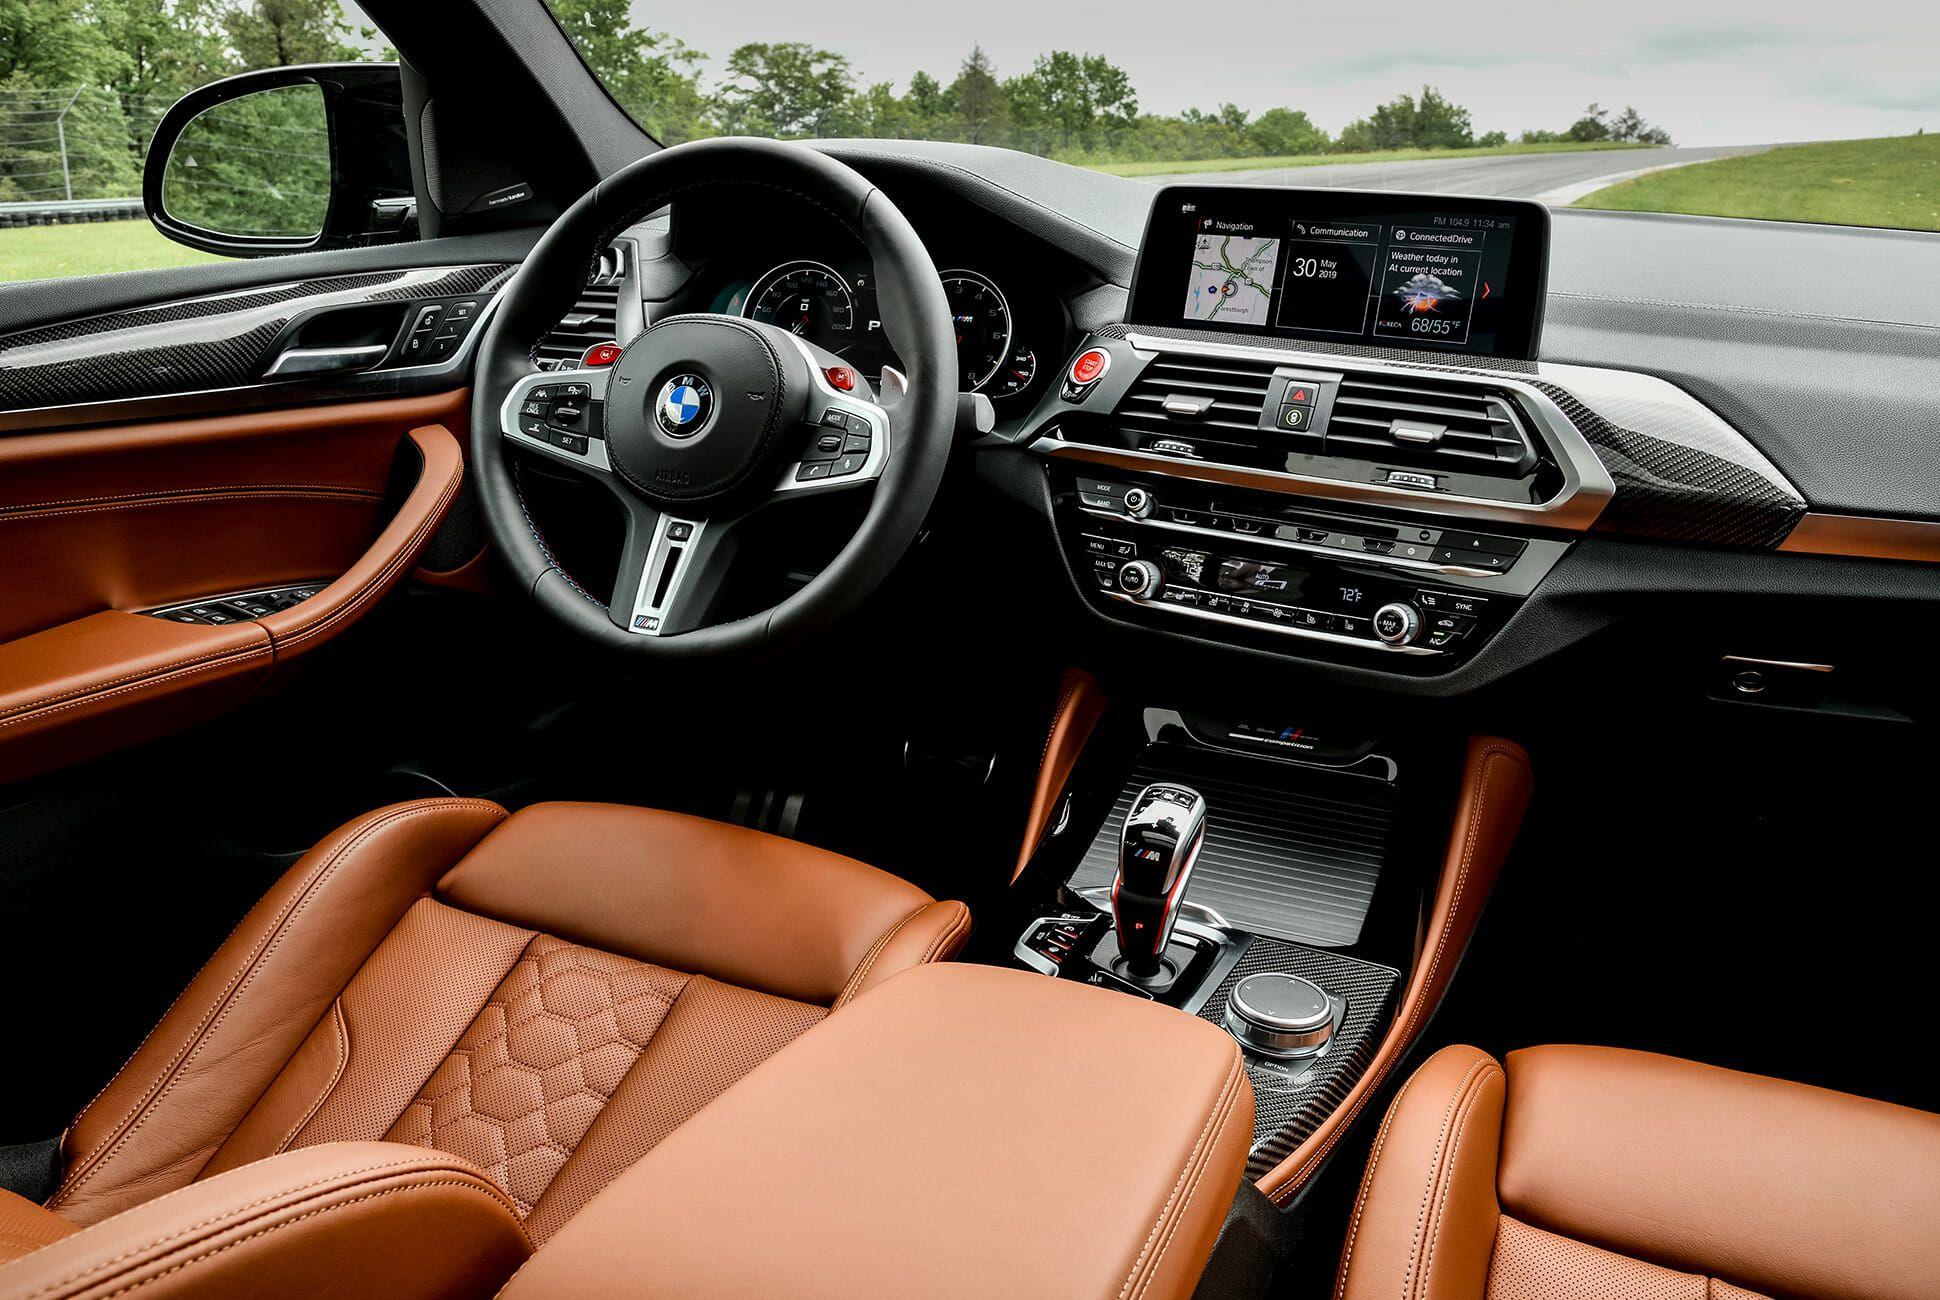 2020-BMW-X3-M-X4-M-Review-gear-patrol-slide-10